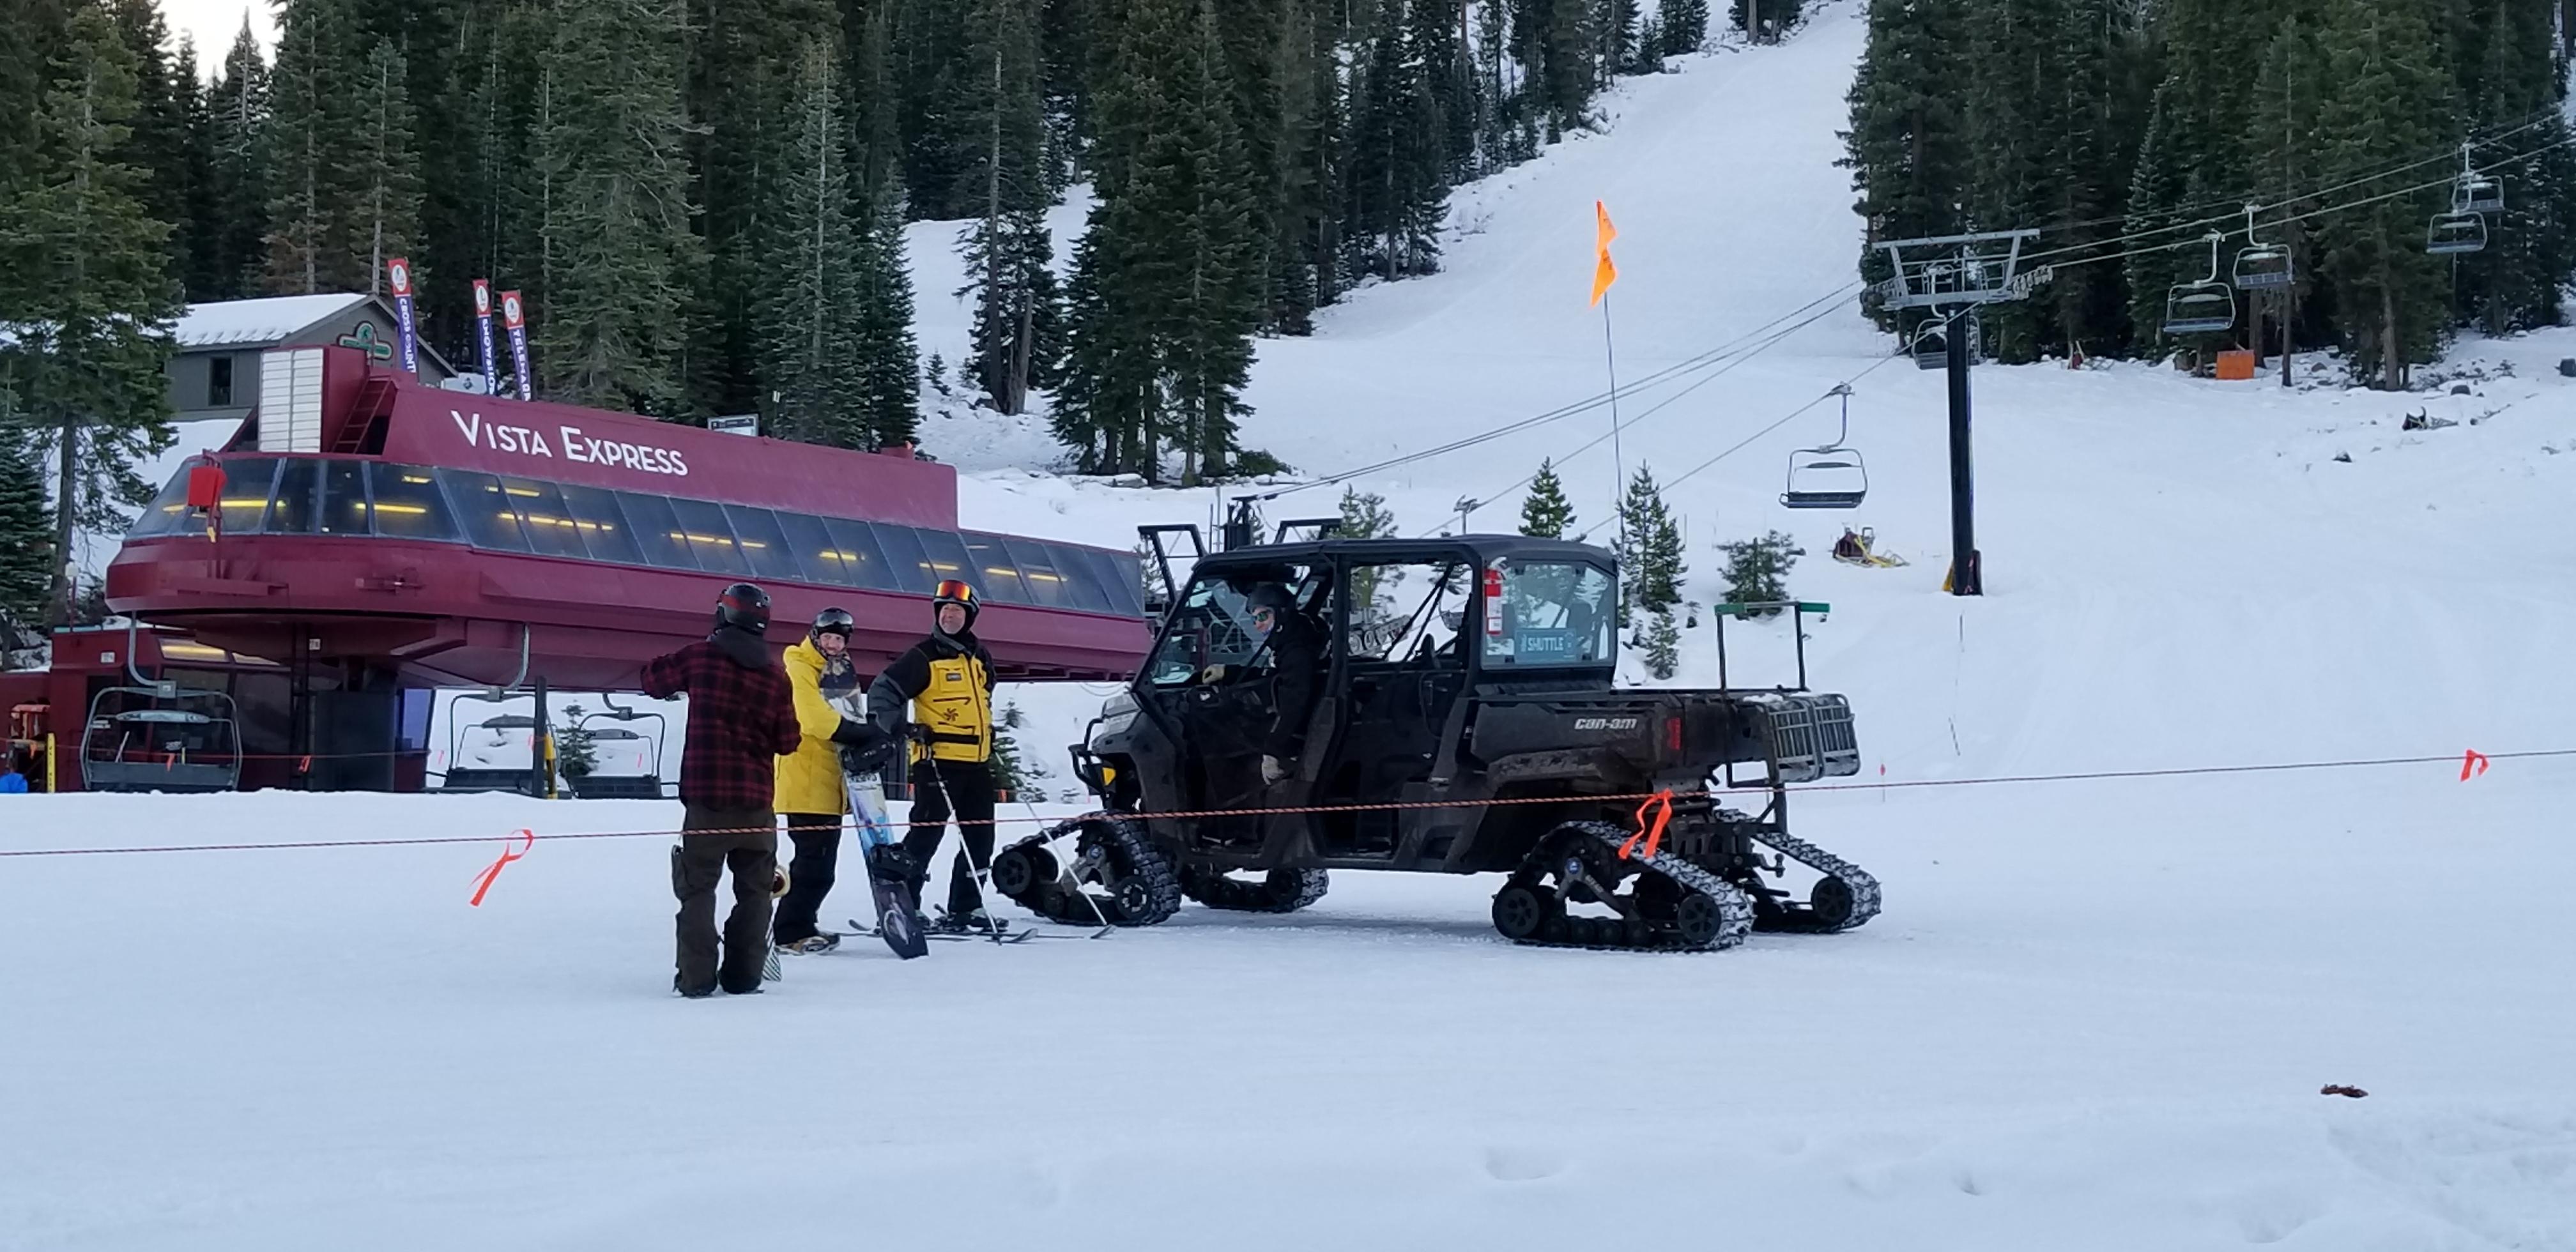 Northstar's free Snowcat ride service